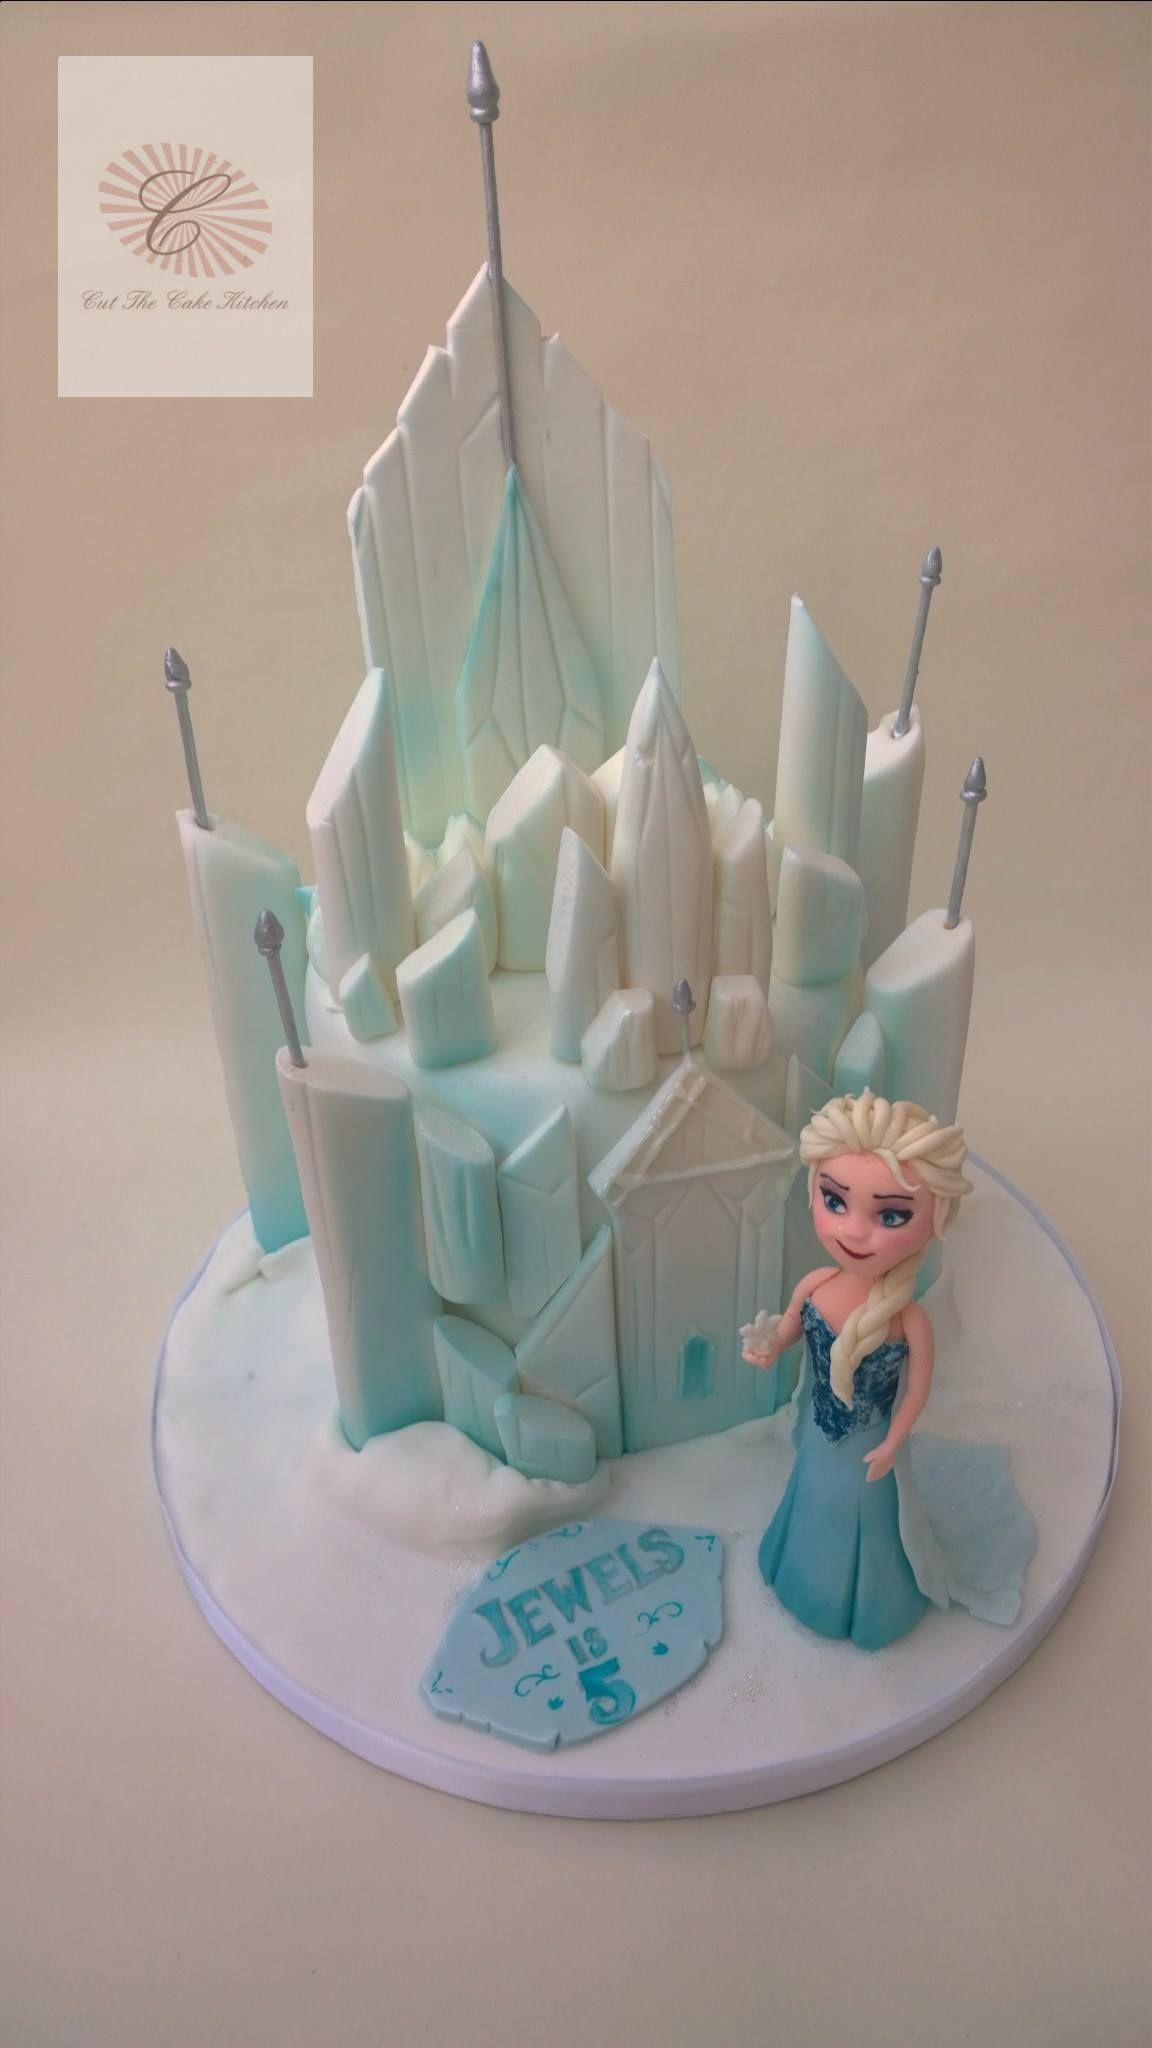 Frozen Birthday Cake Elsa Ice Palace wwwcutthecakekitchencouk